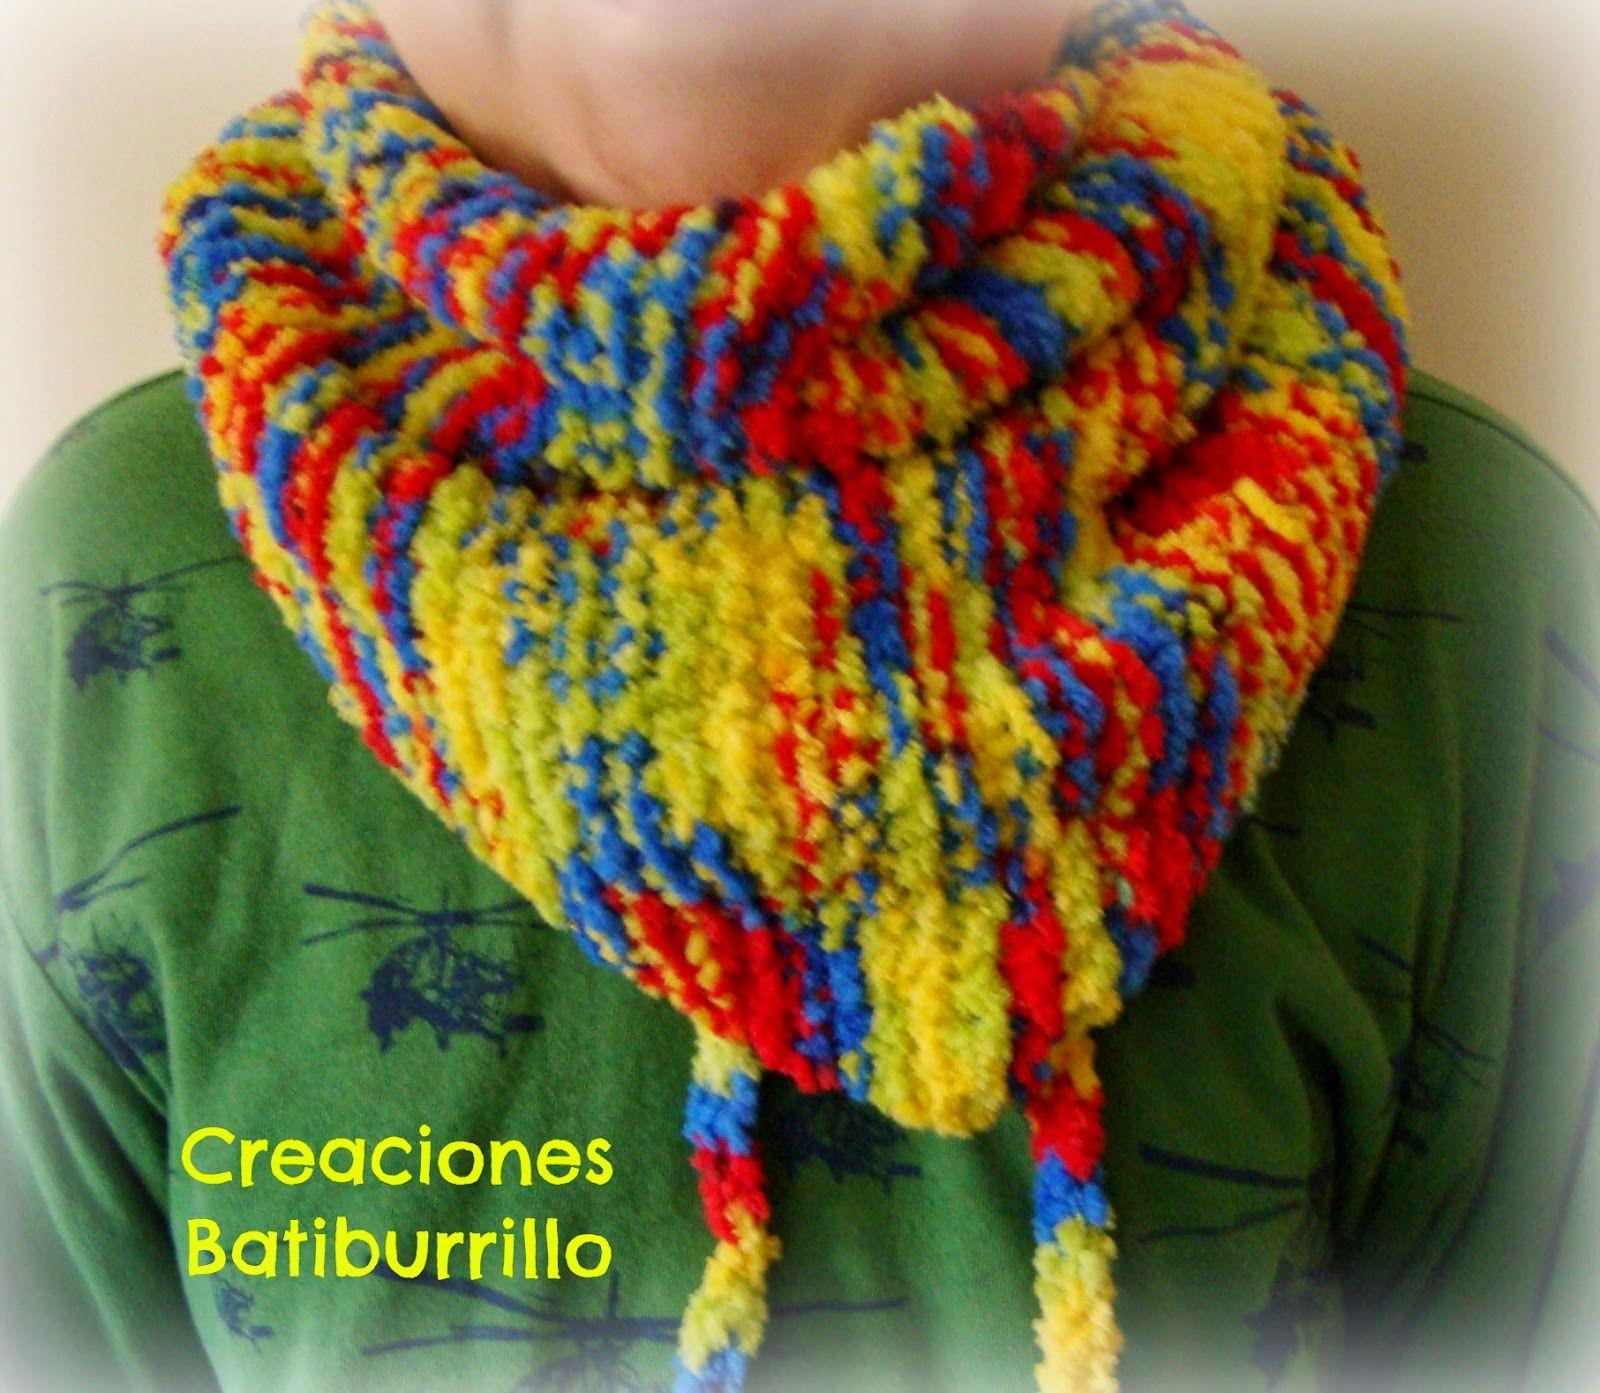 CREACIONES BATIBURRILLO: BUFANDA MODELO BAKTUS